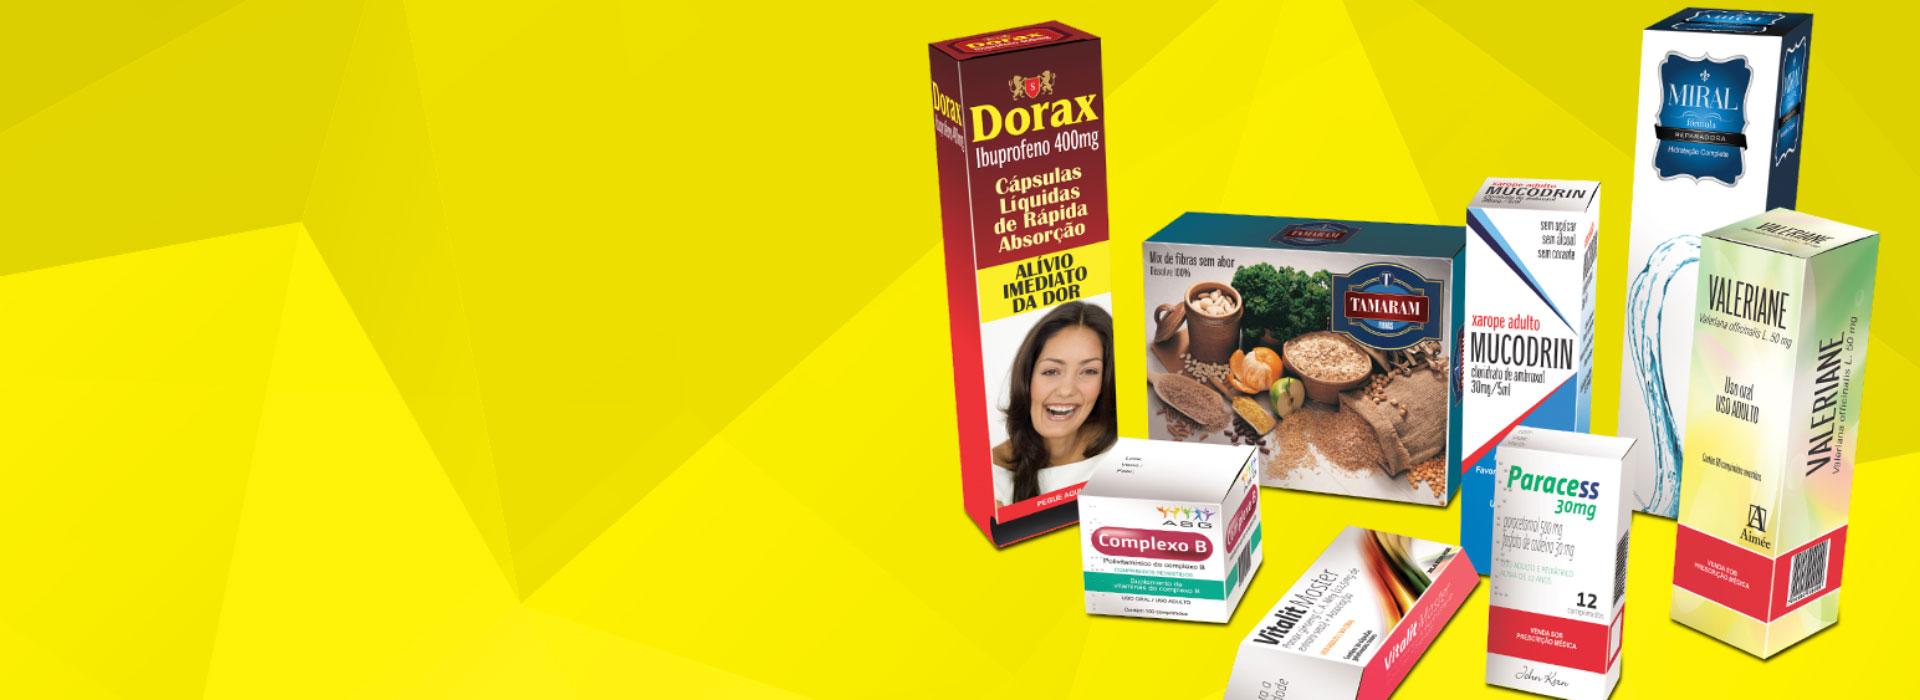 a3a58f5eacec6 Embalagens e rótulos diferenciados para o setor de farmaceutico